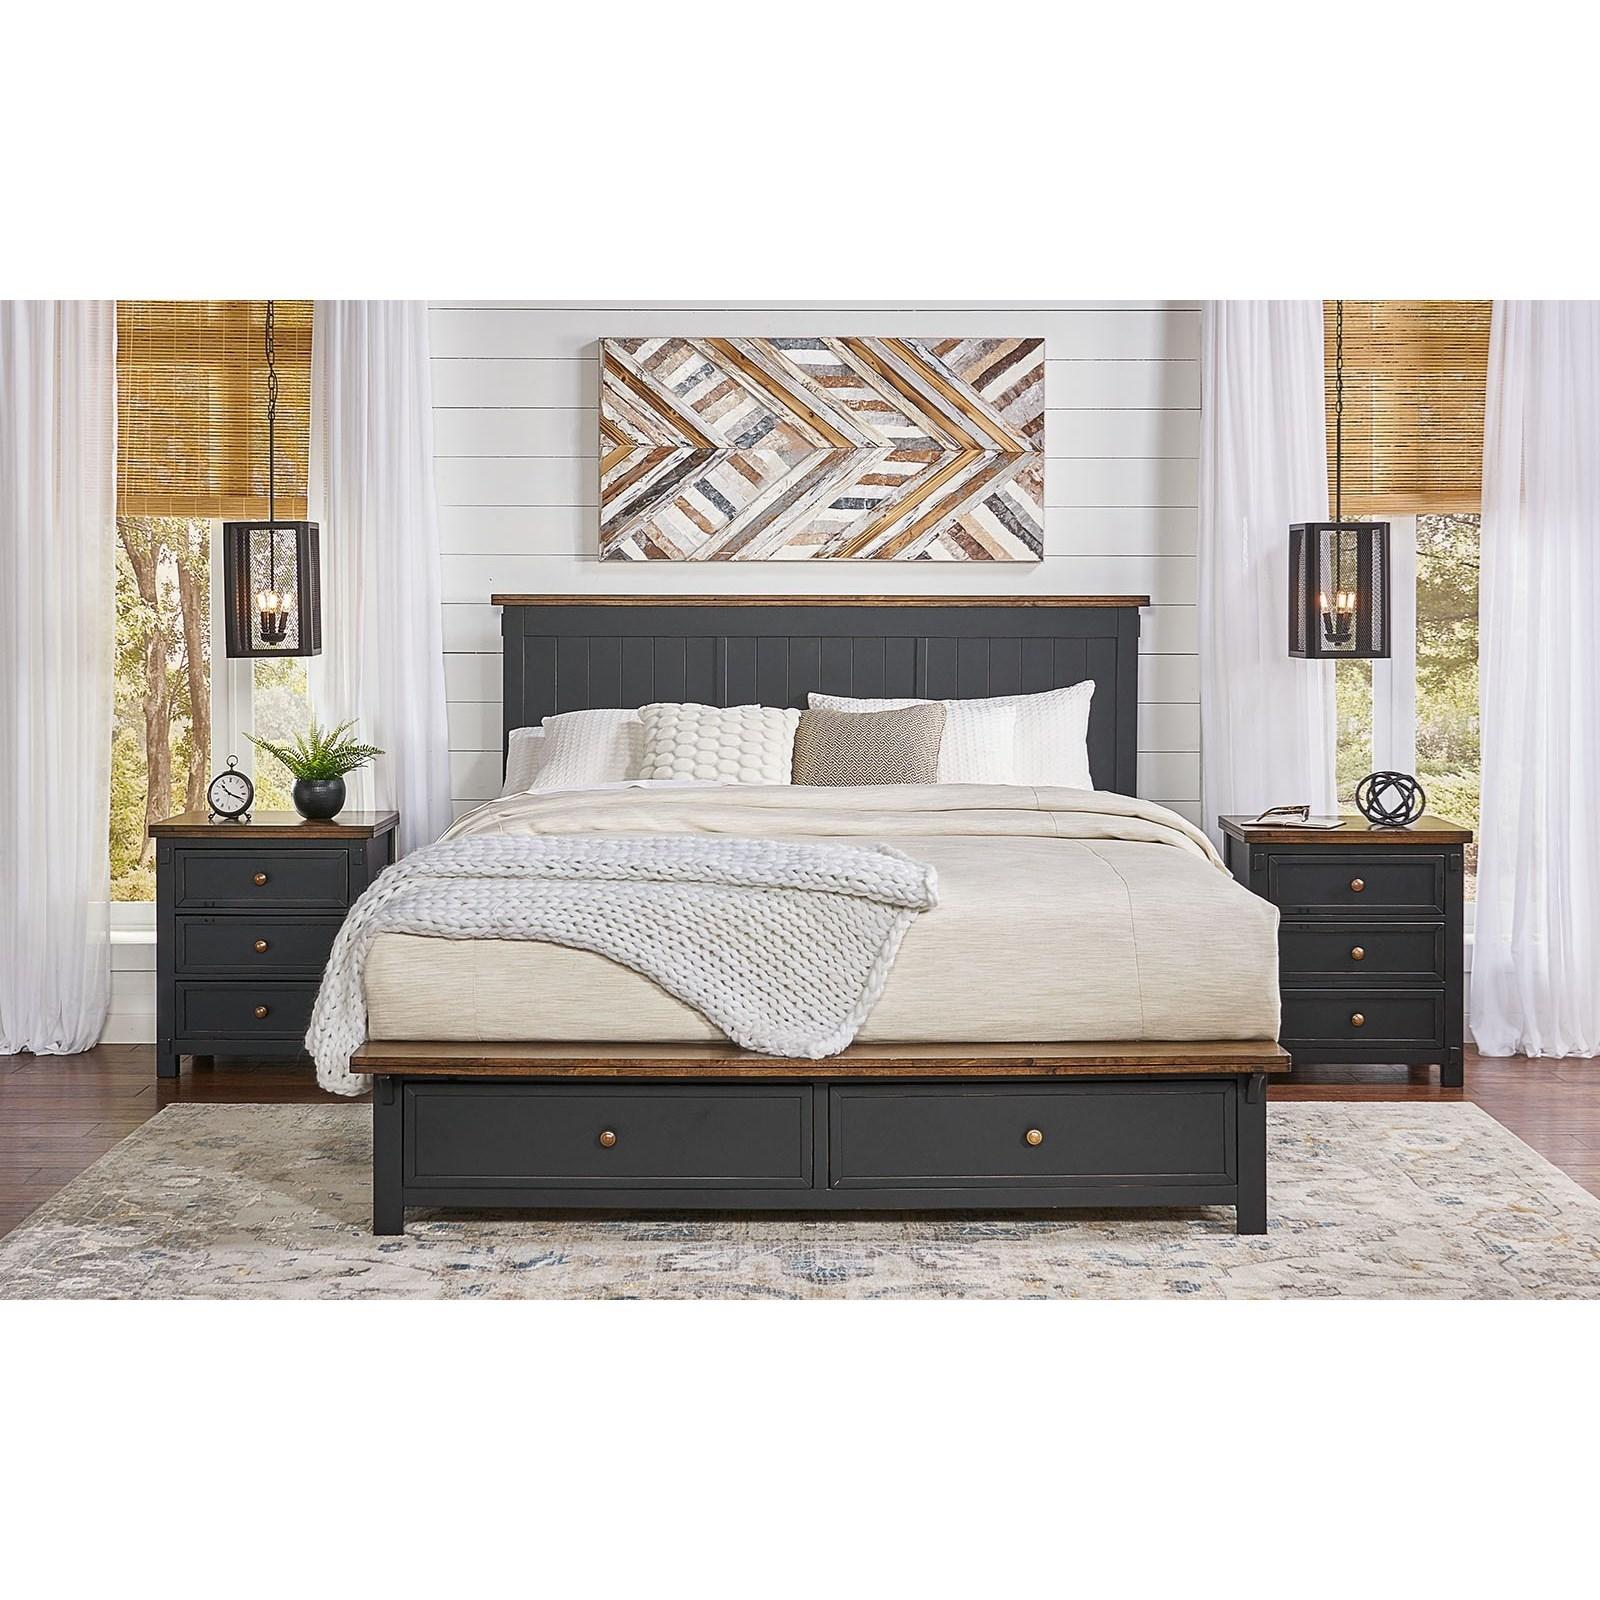 Rustic King Storage Bed